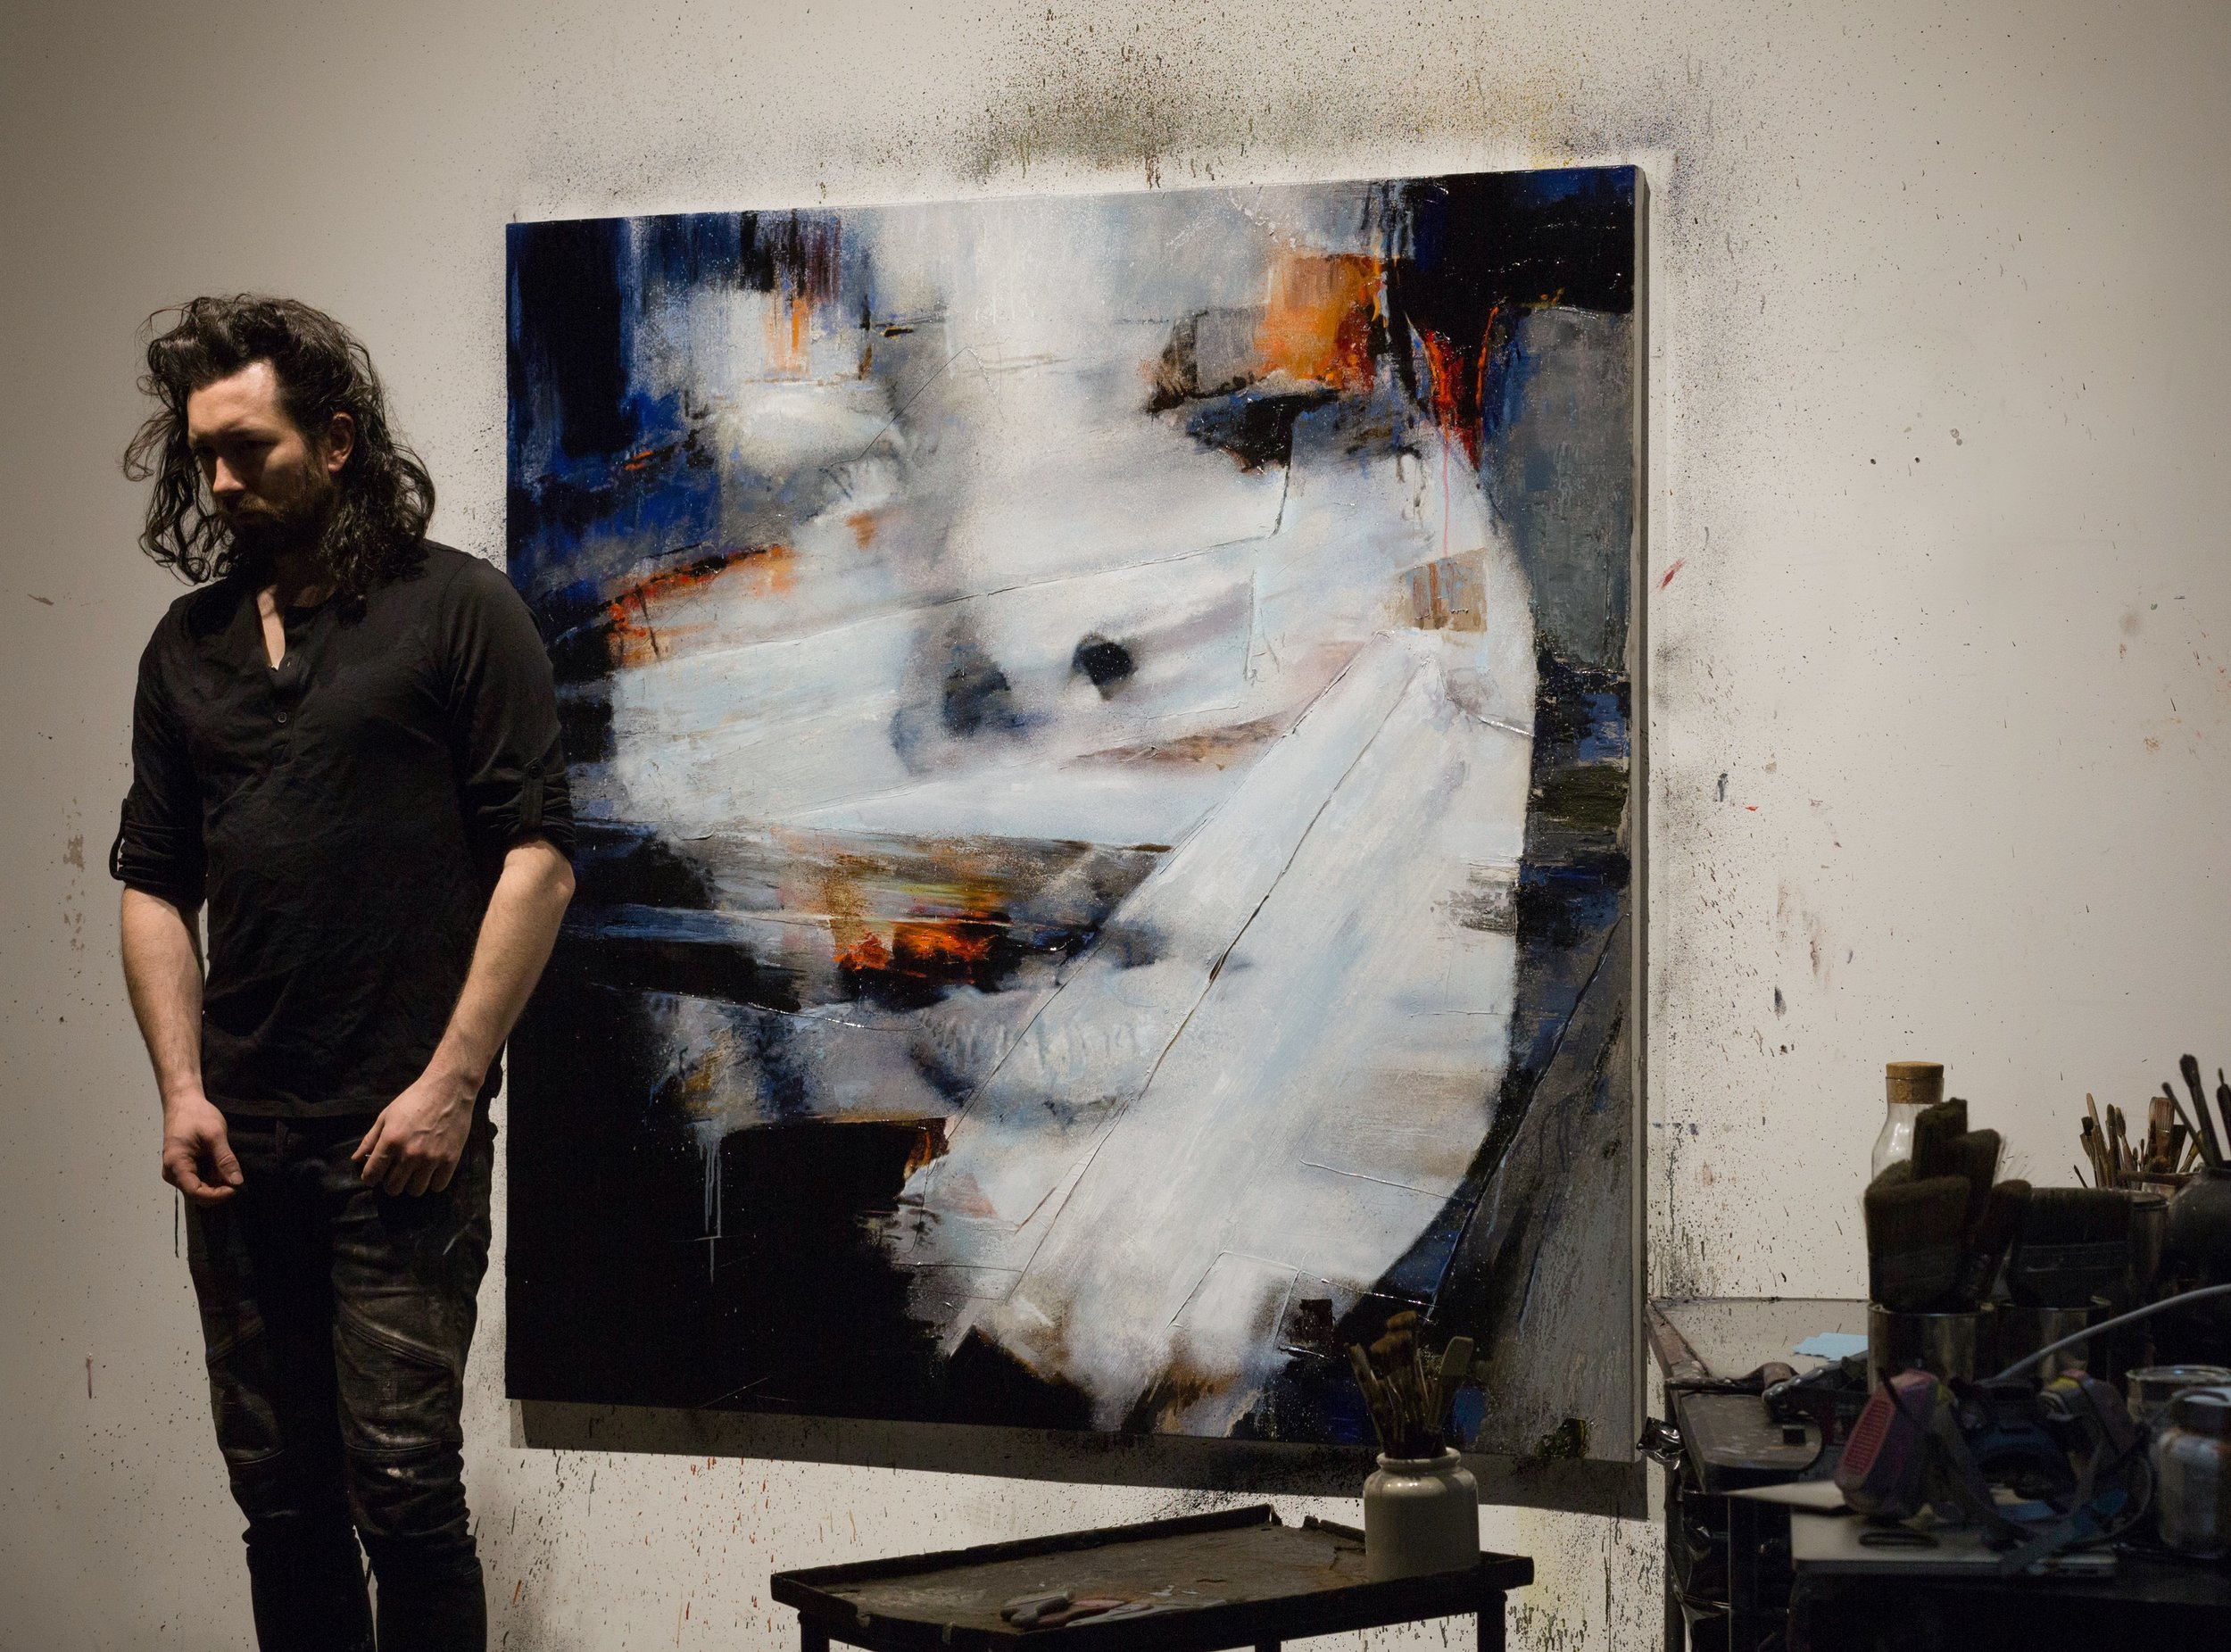 baugh_painting_art.jpg